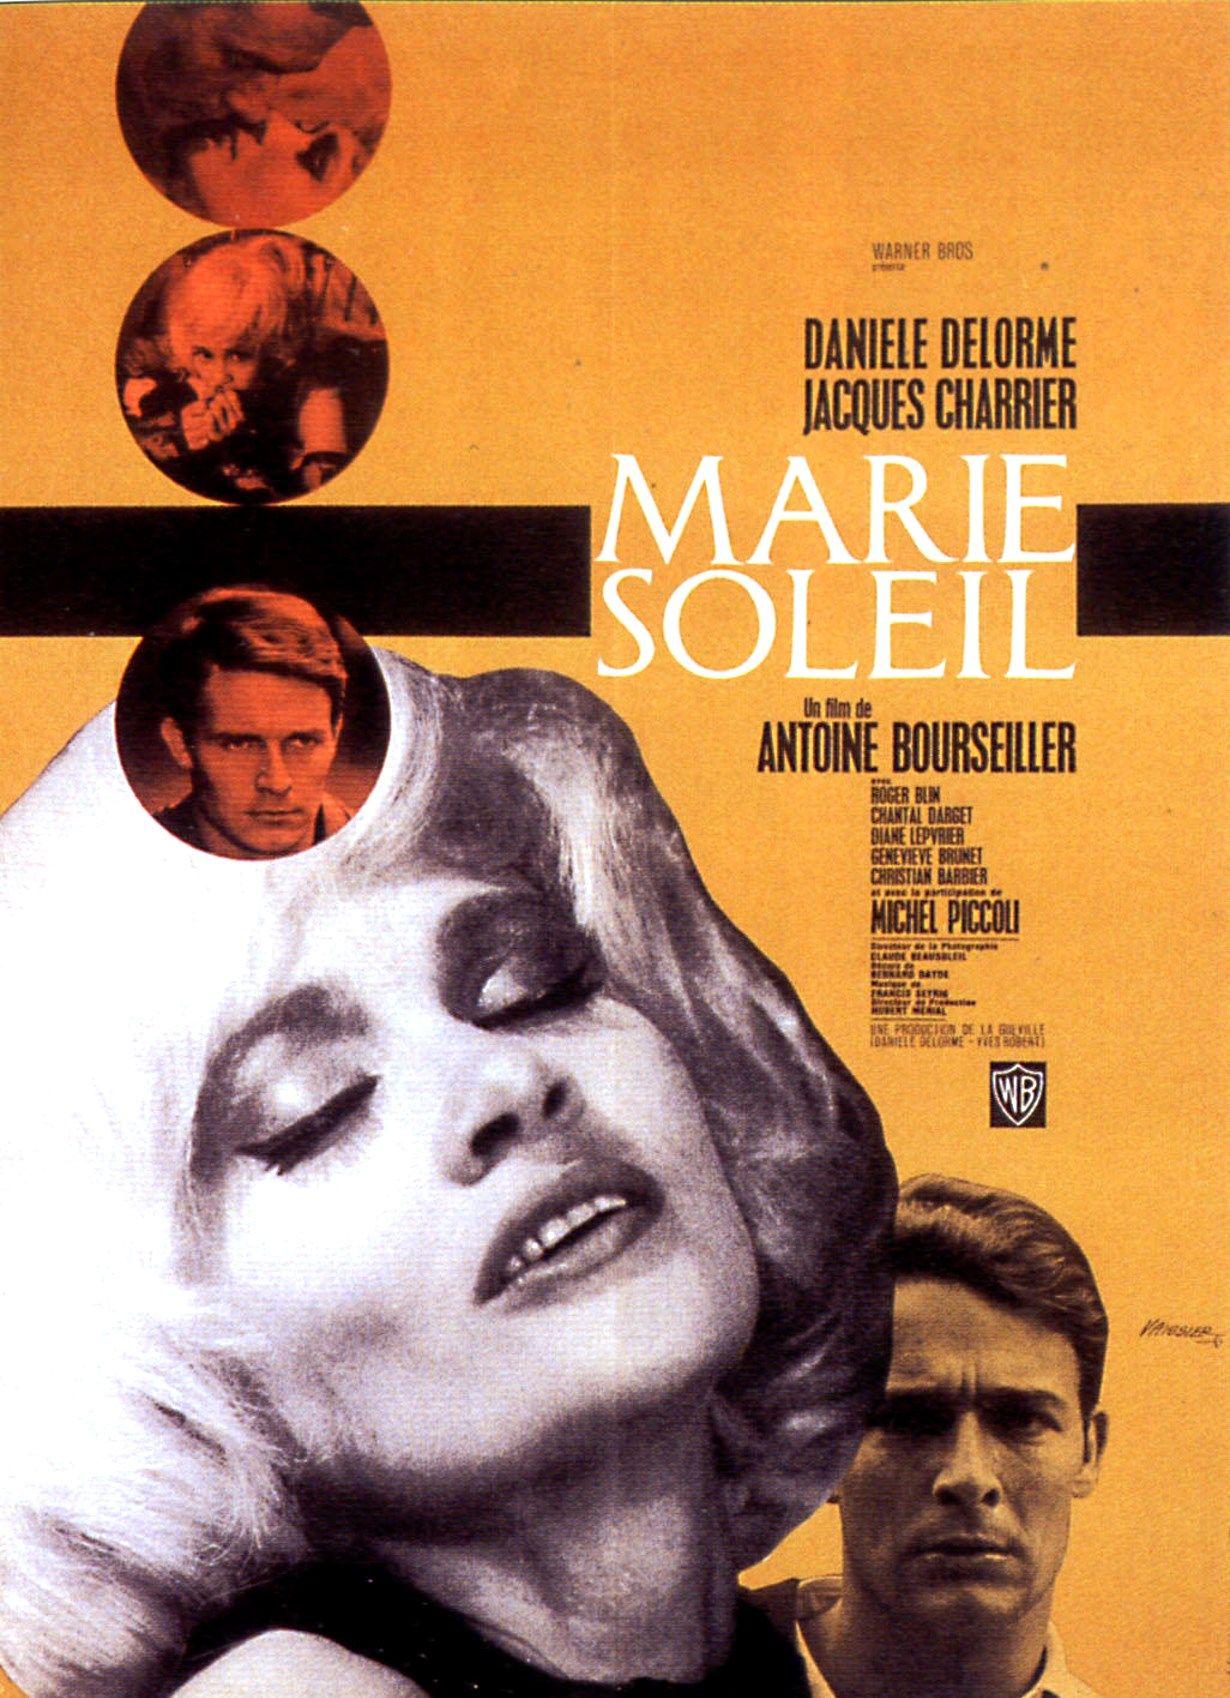 Marie Soleil - 04-03-1966